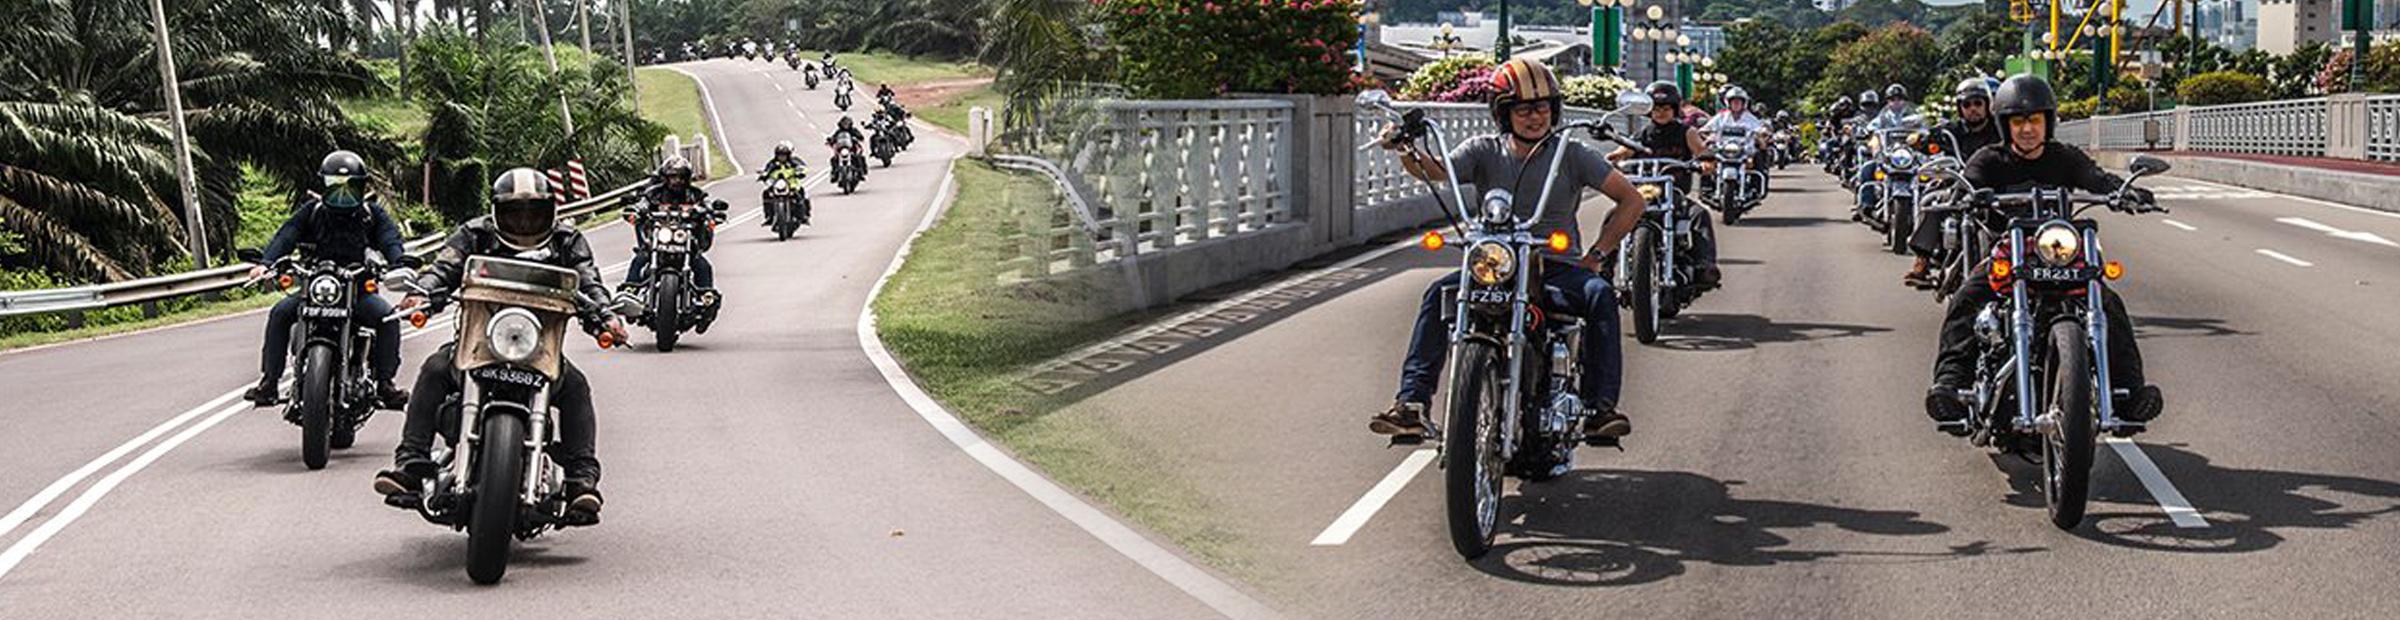 Harley-Davidson<sup>®</sup> Events